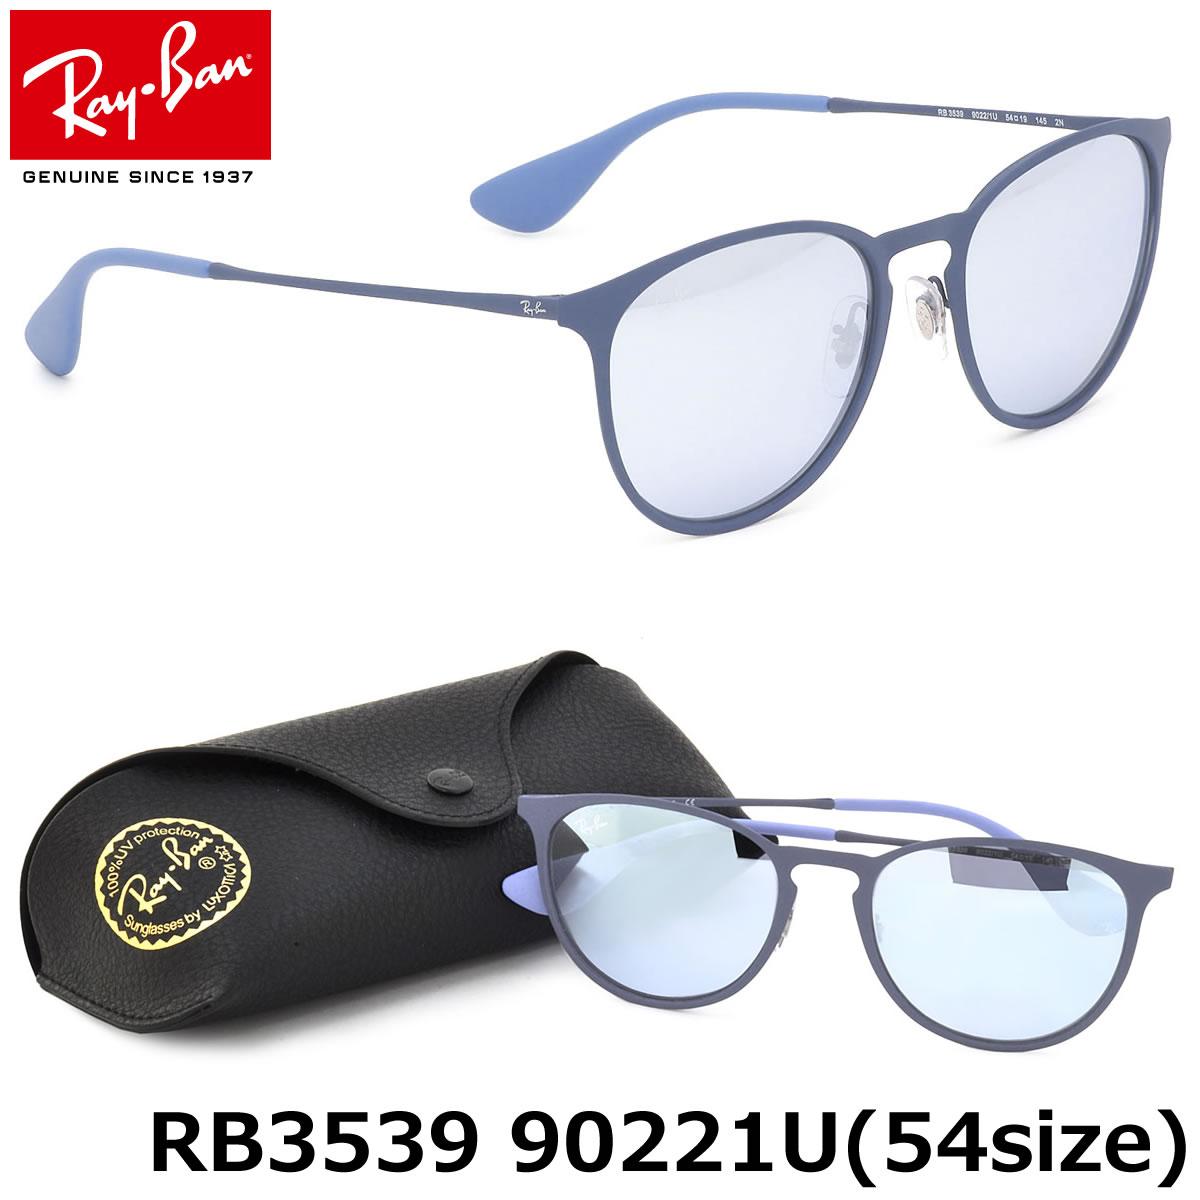 2e39c99d53b60 The sharp model that RB3539 made that popular model RB4171F